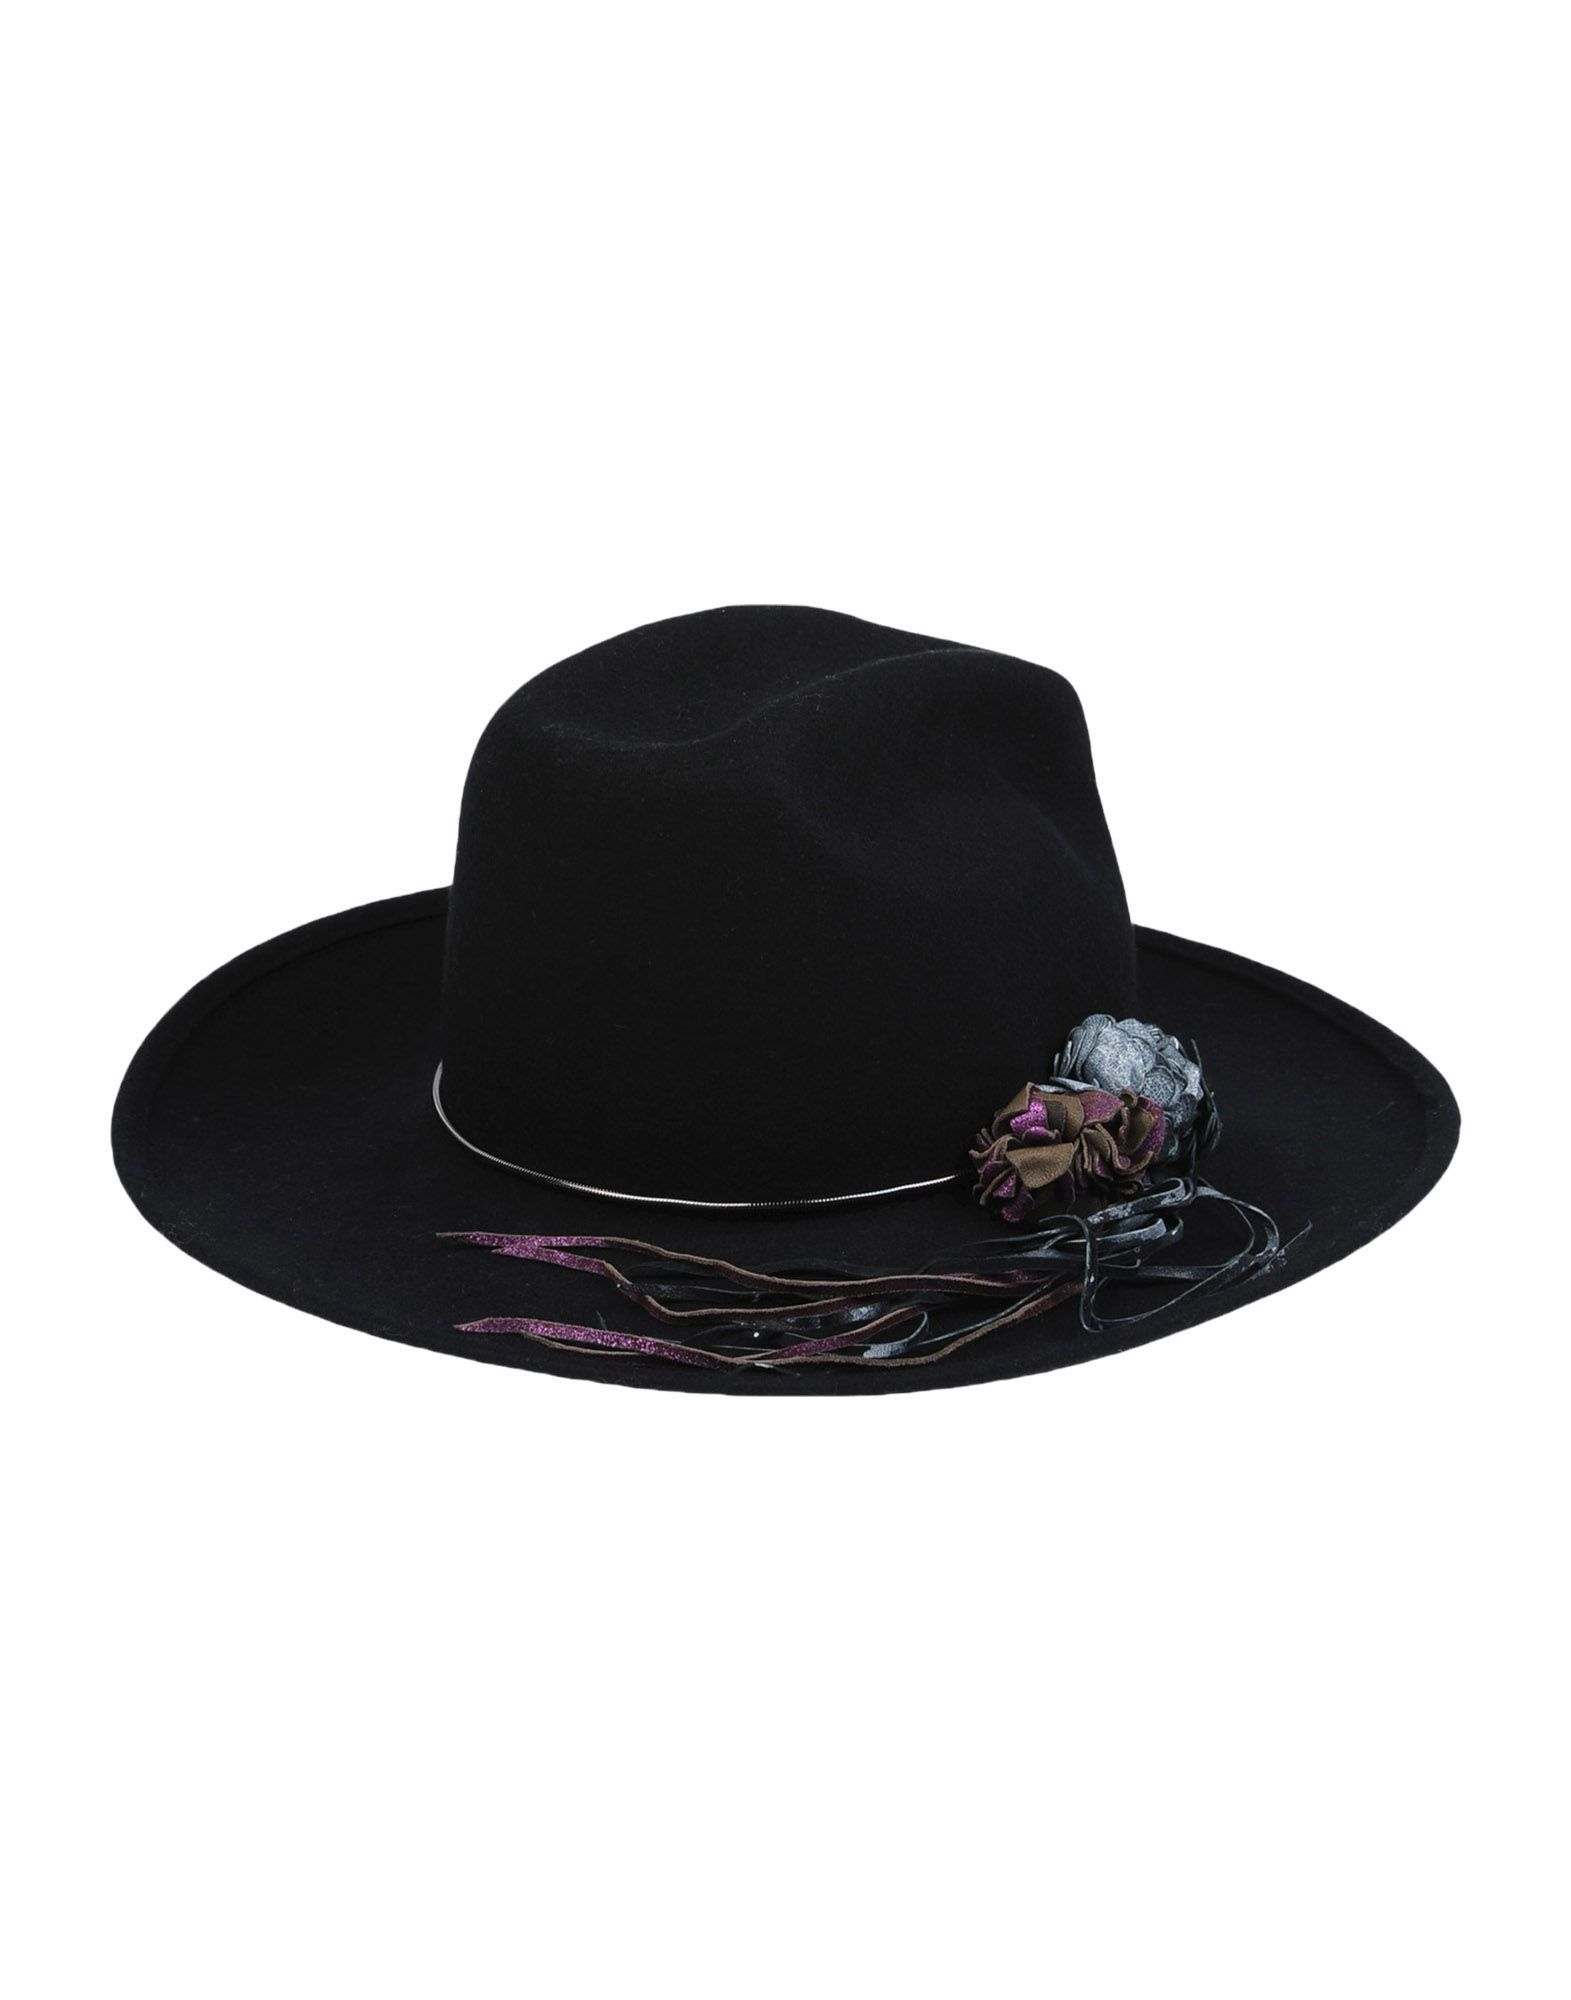 7bbffb87f31 GOLDEN GOOSE Hat.  goldengoose  all